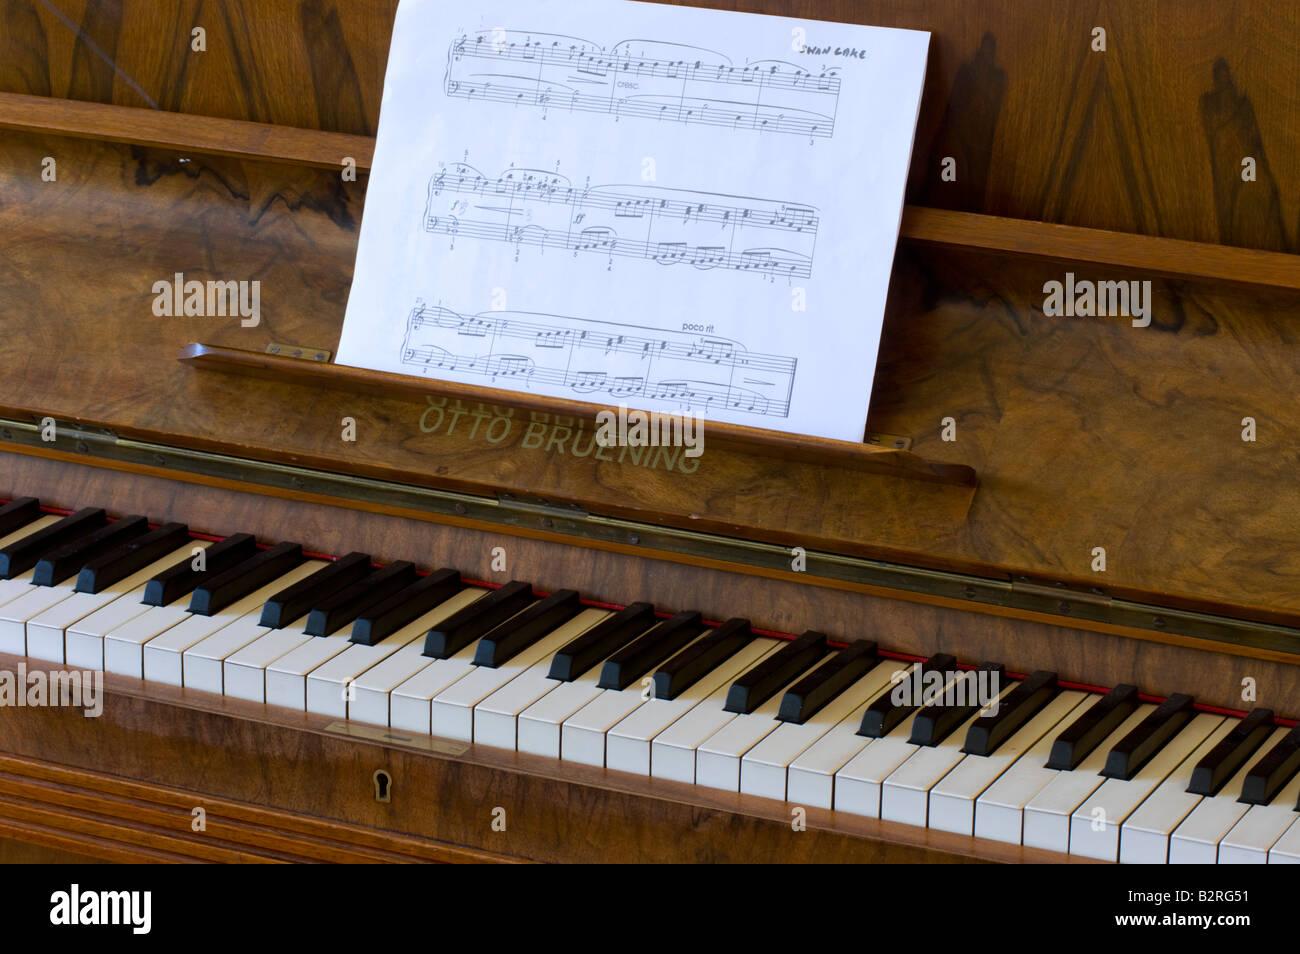 Piano Keys And Sheet Music Stock Photo 18957261 Alamy